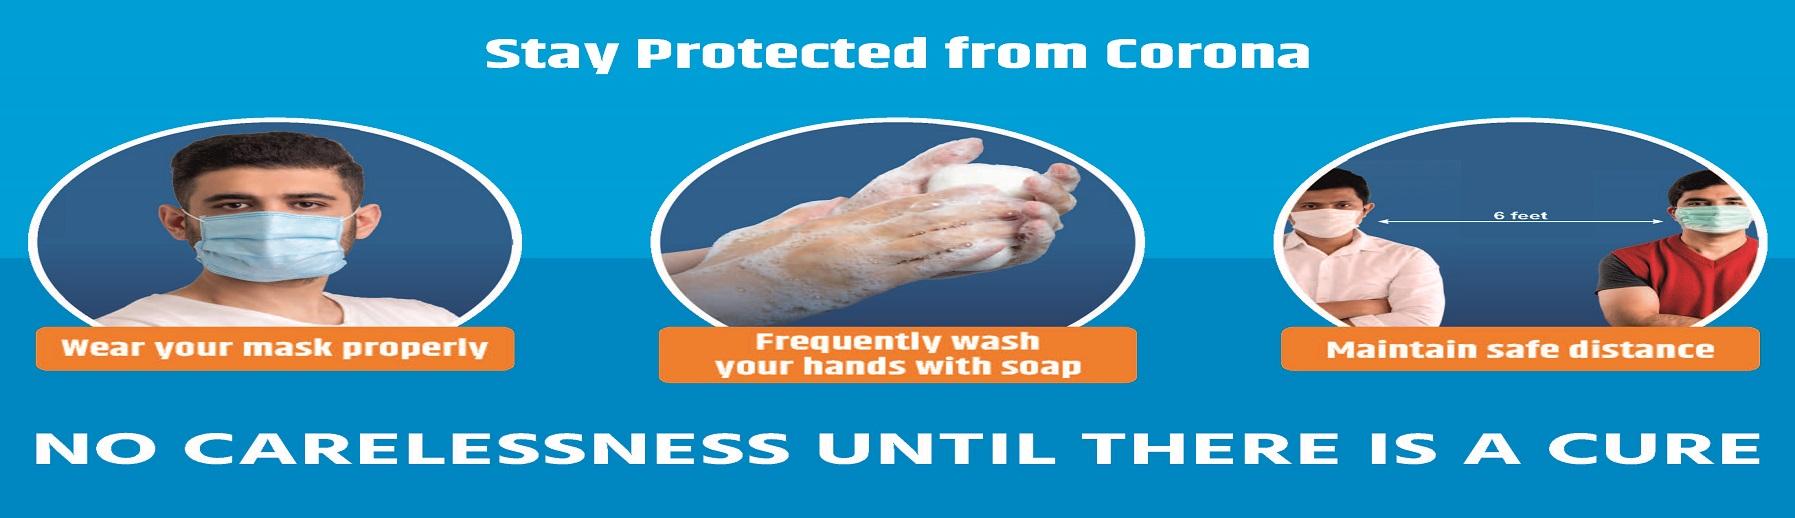 Prevent Corona Virus image